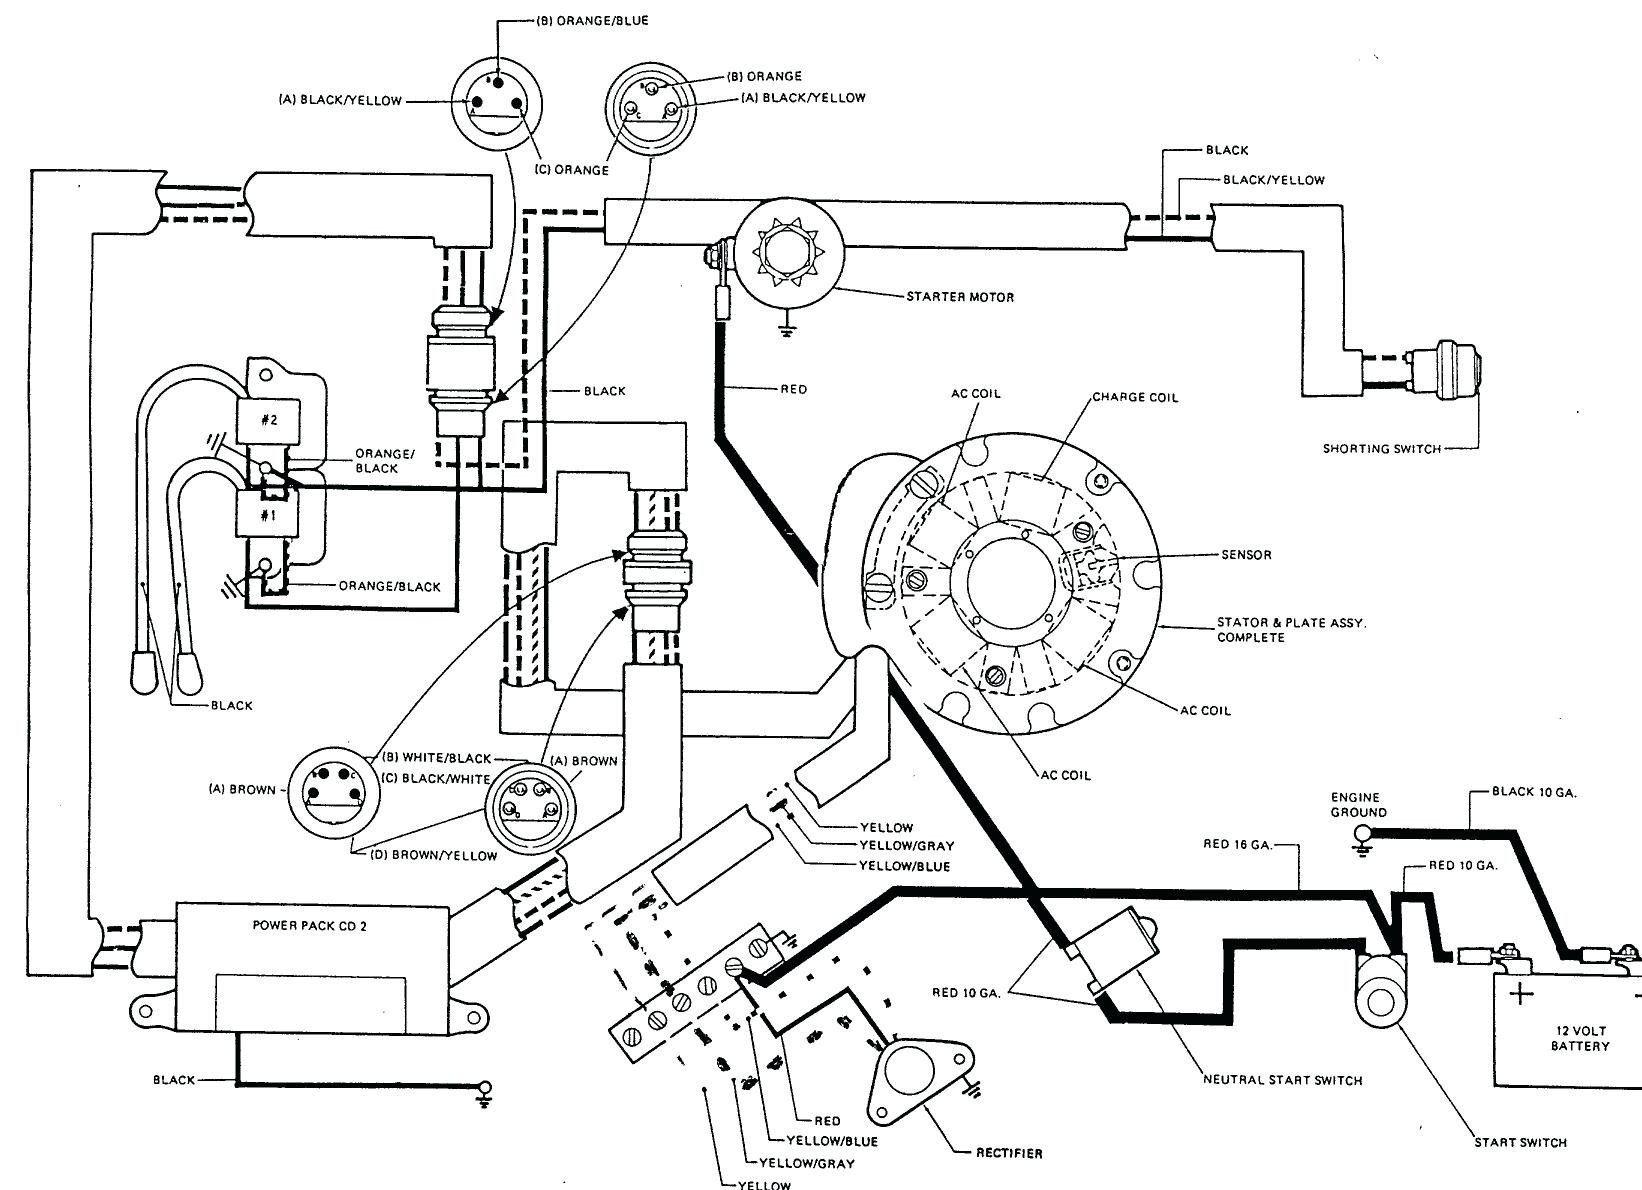 [DIAGRAM] Yamaha Outboard Electric Choke Wiring Diagram